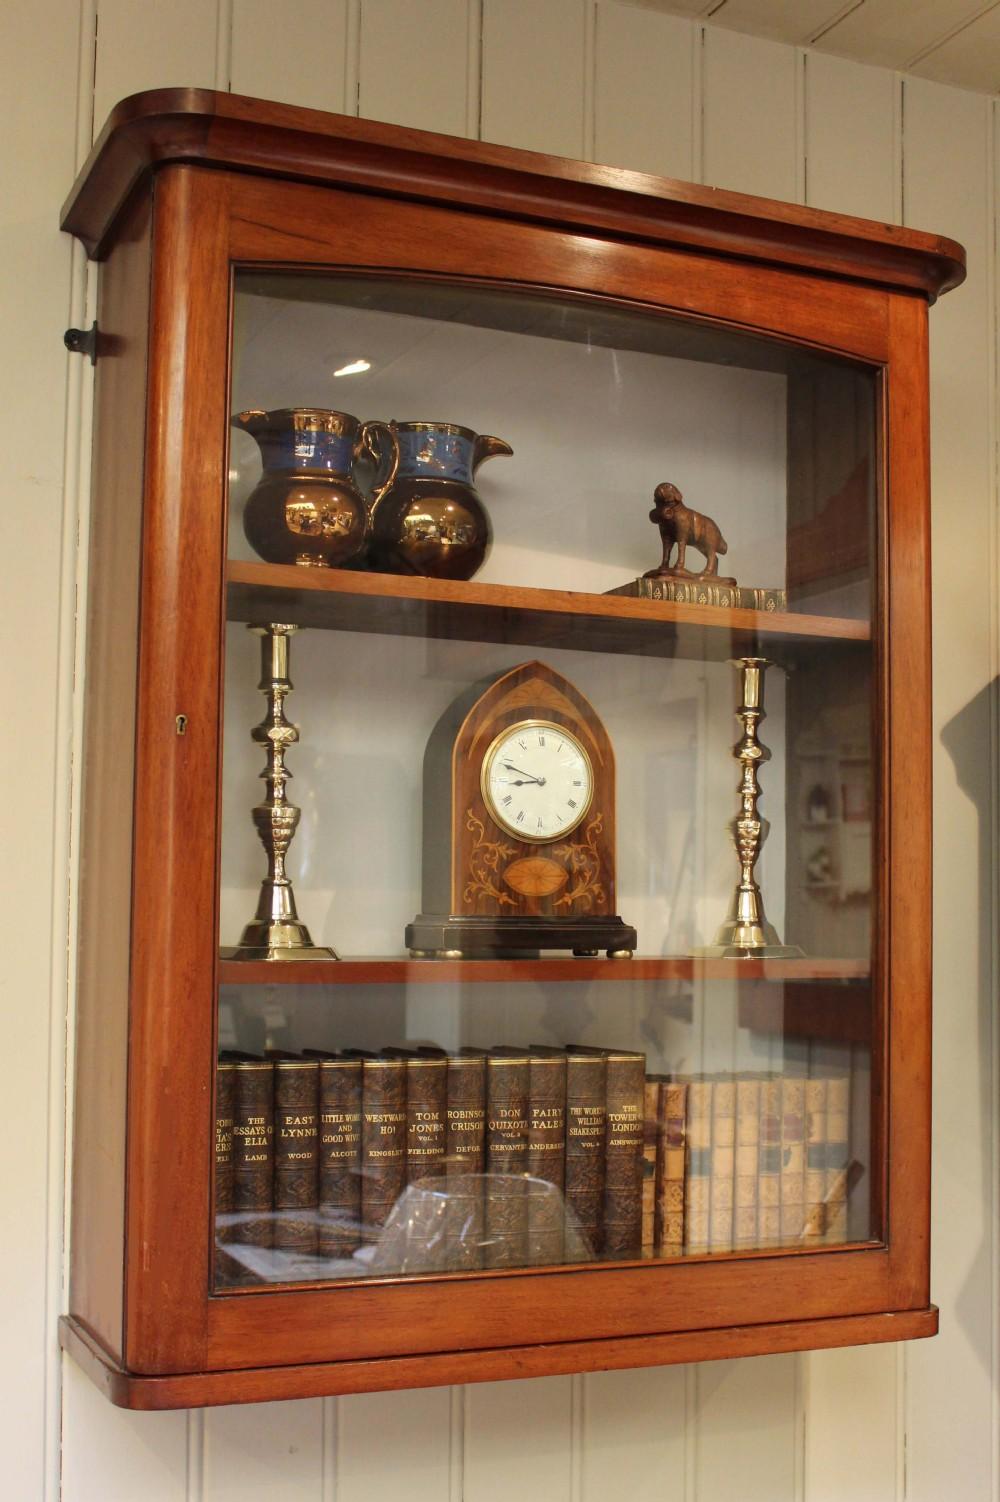 Victorian Mahogany Wall Display Cabinet - Antique Display Cabinets Uk Creativeadvertisingblog.com